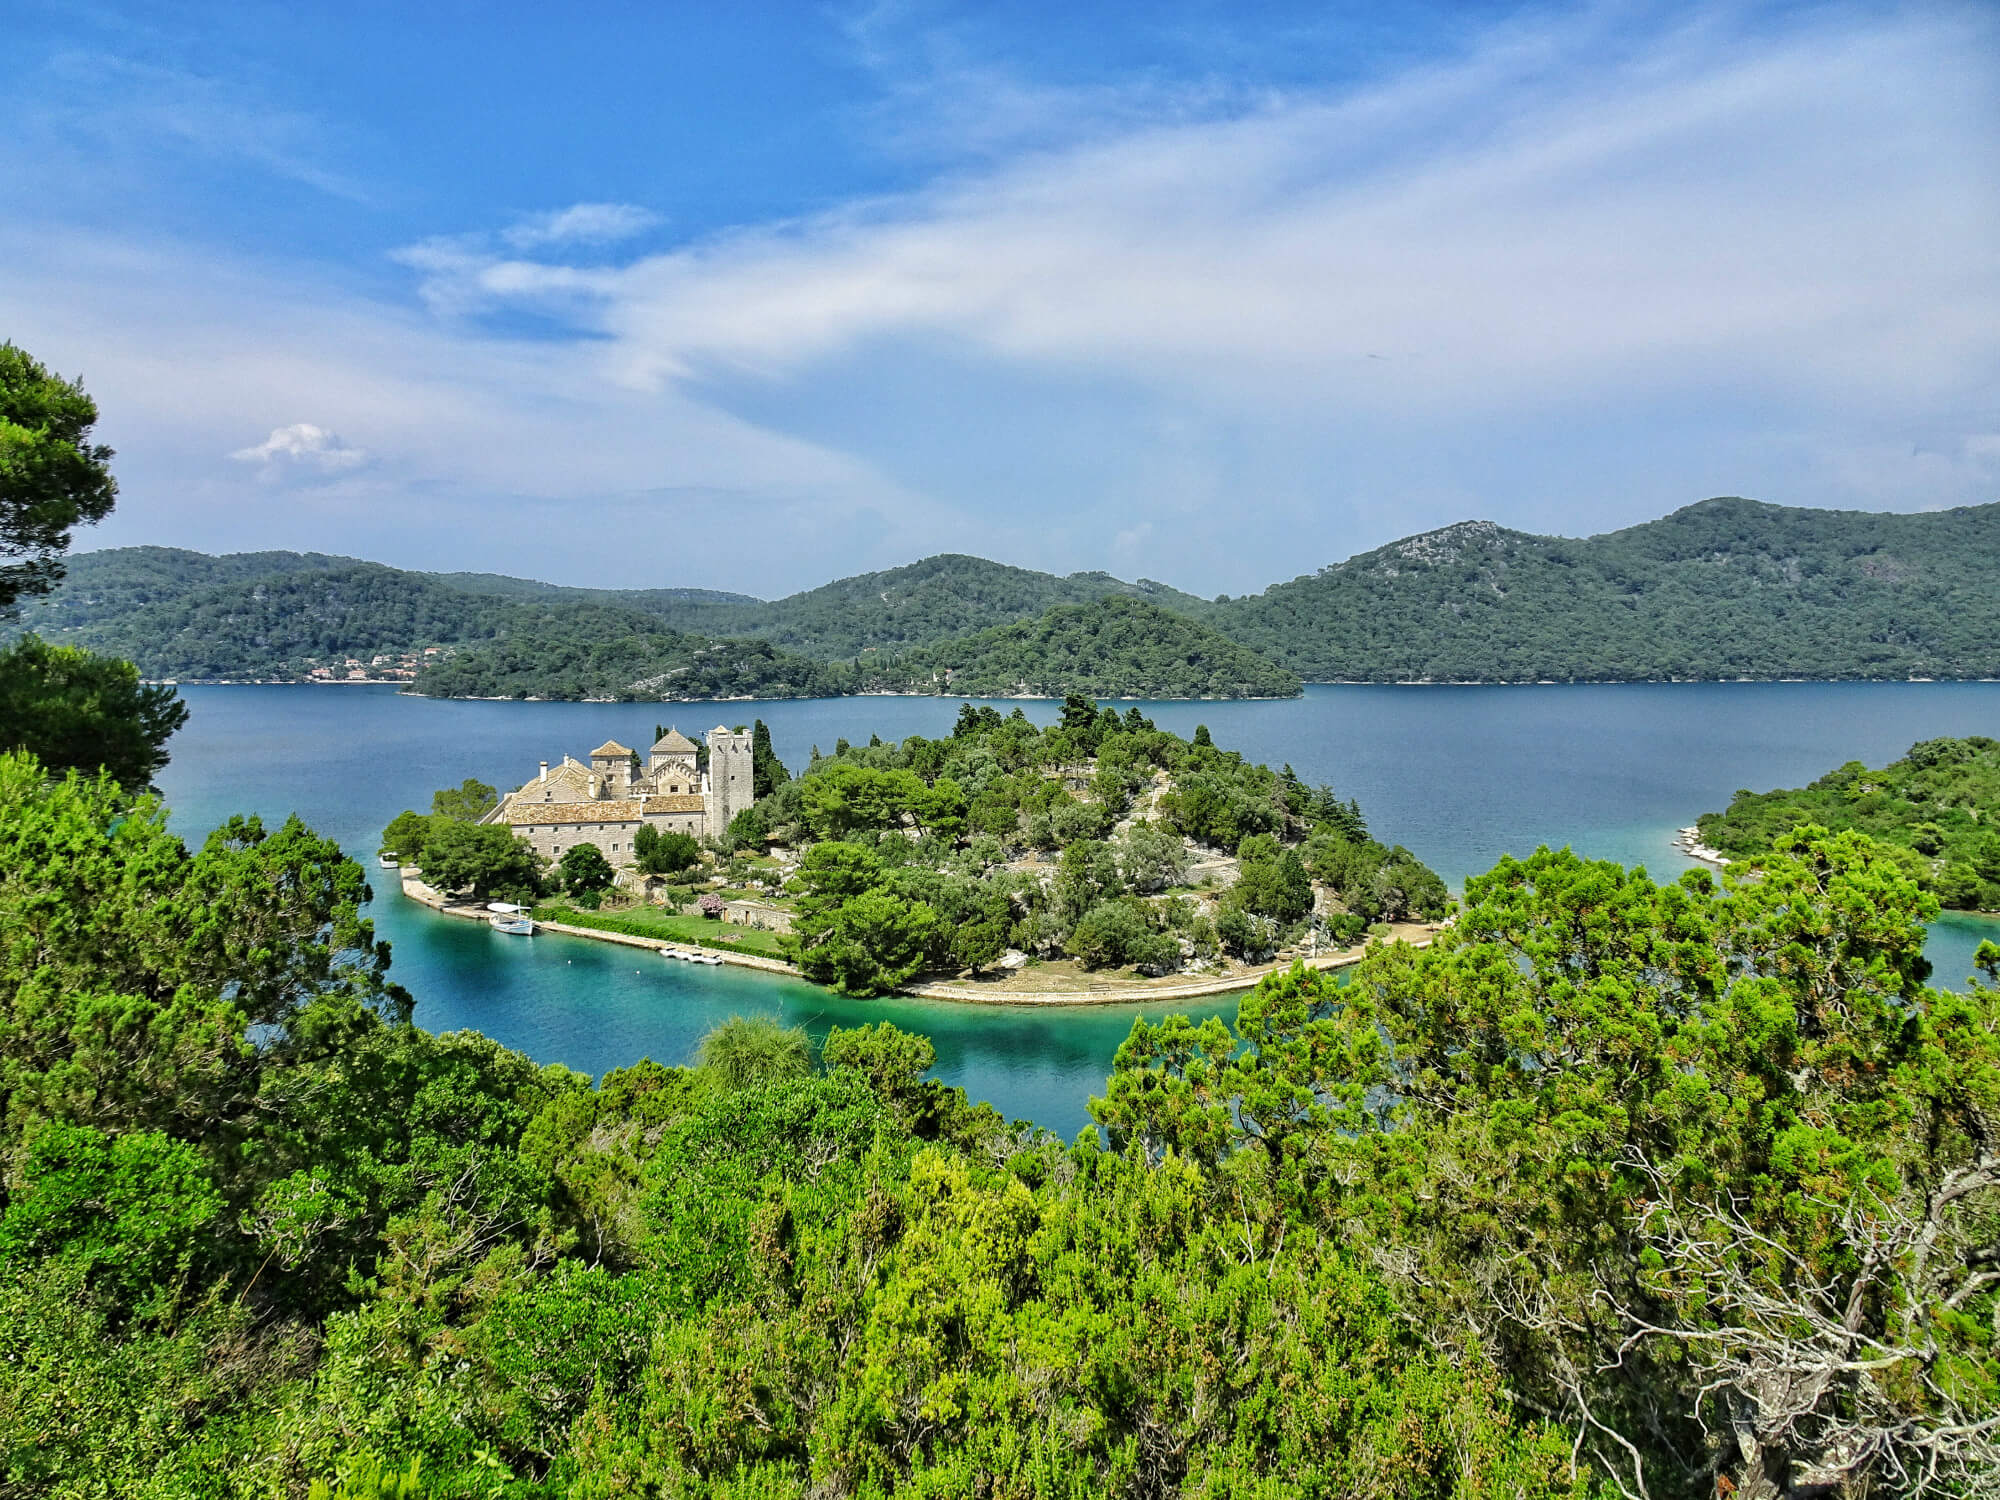 Mljet Island Escape The Crowds Of Dubrovnik World